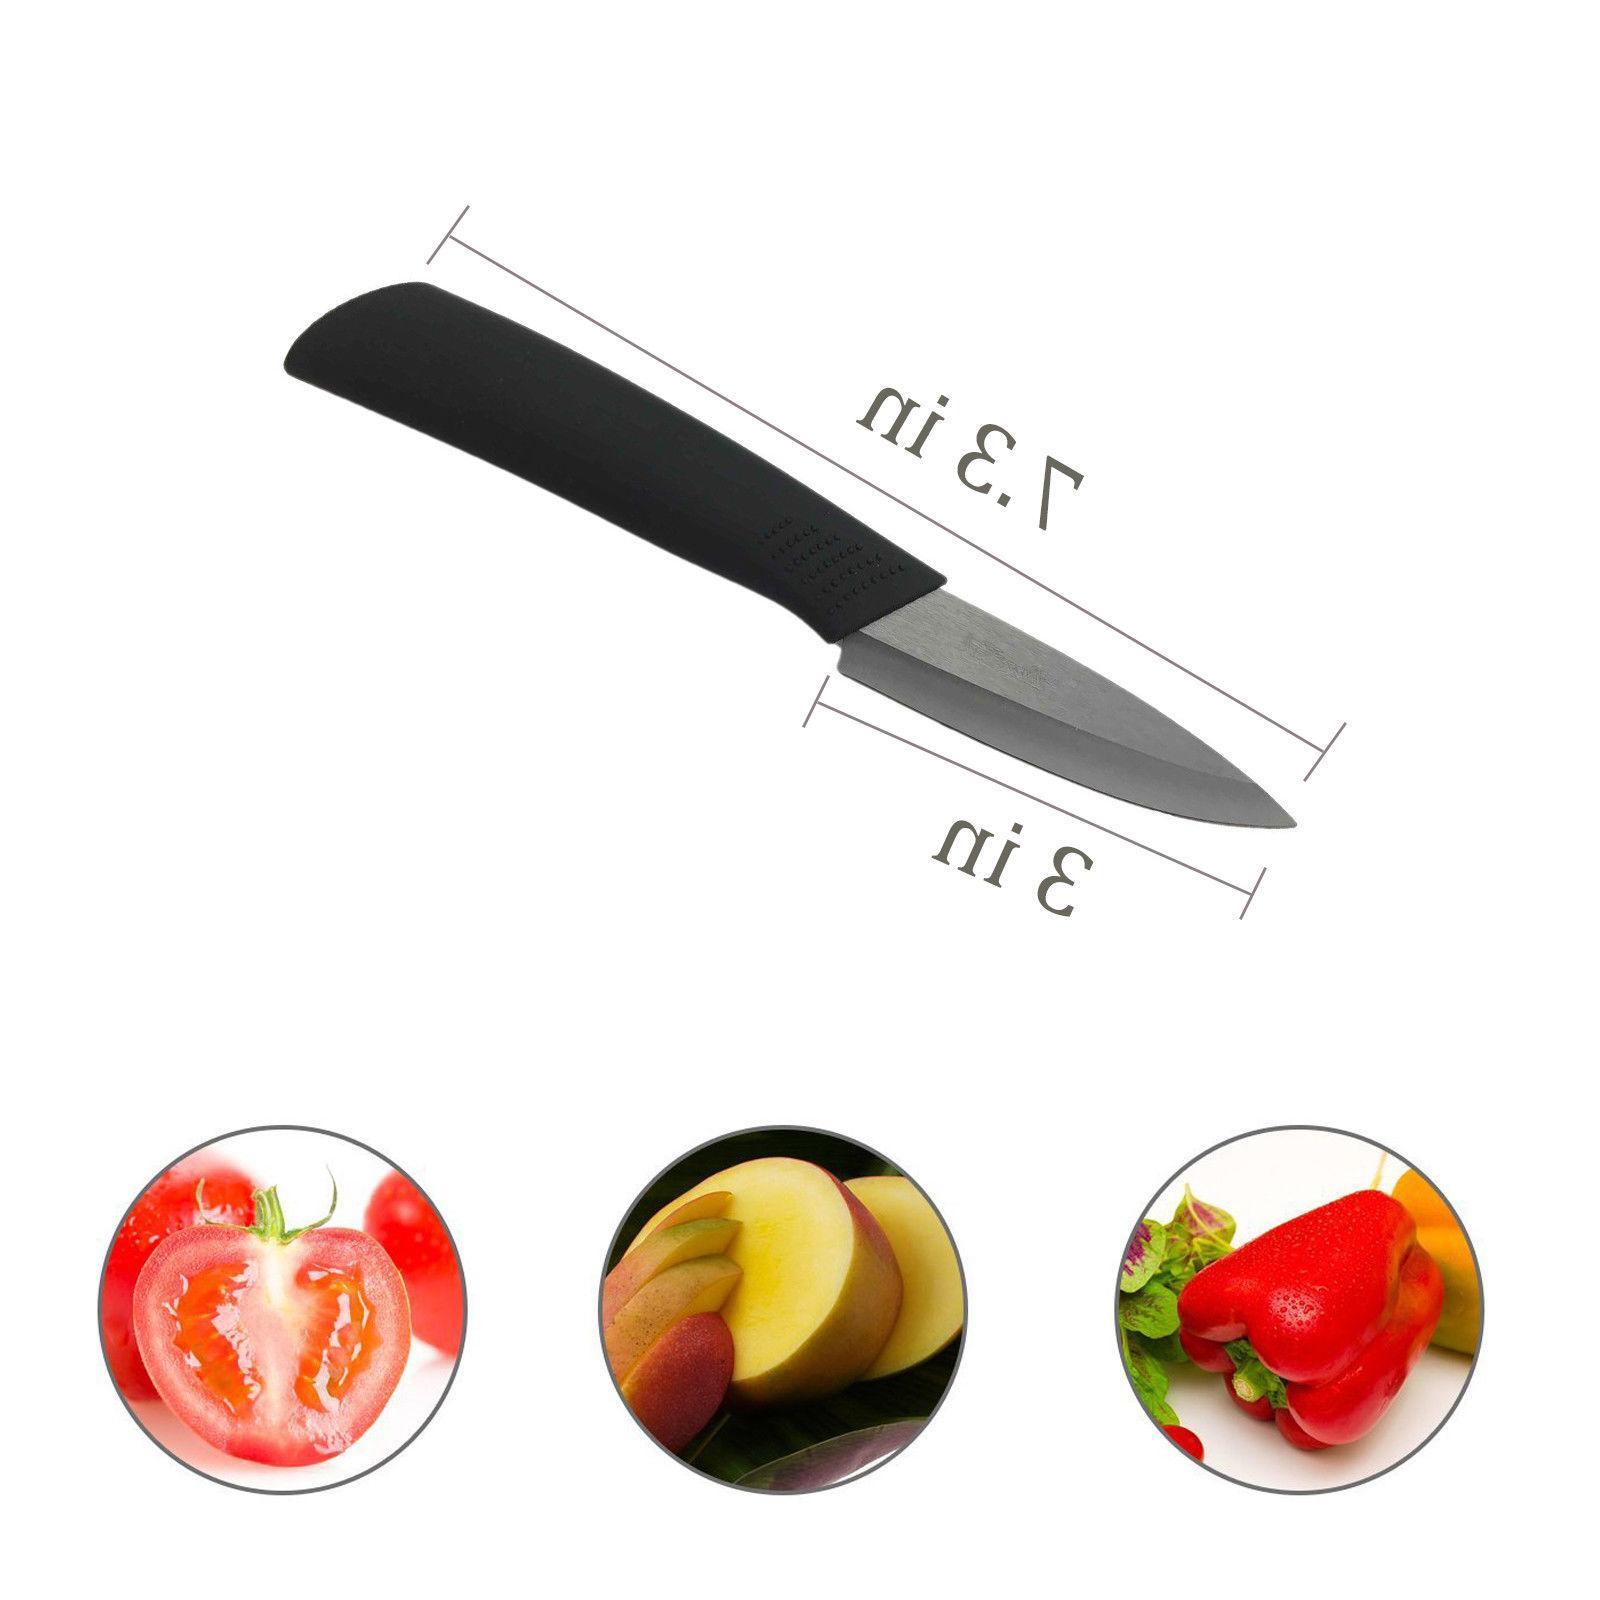 "Ceramic Set Chef's Kitchen Knives 4"" 5"" 6"" Knife Black"